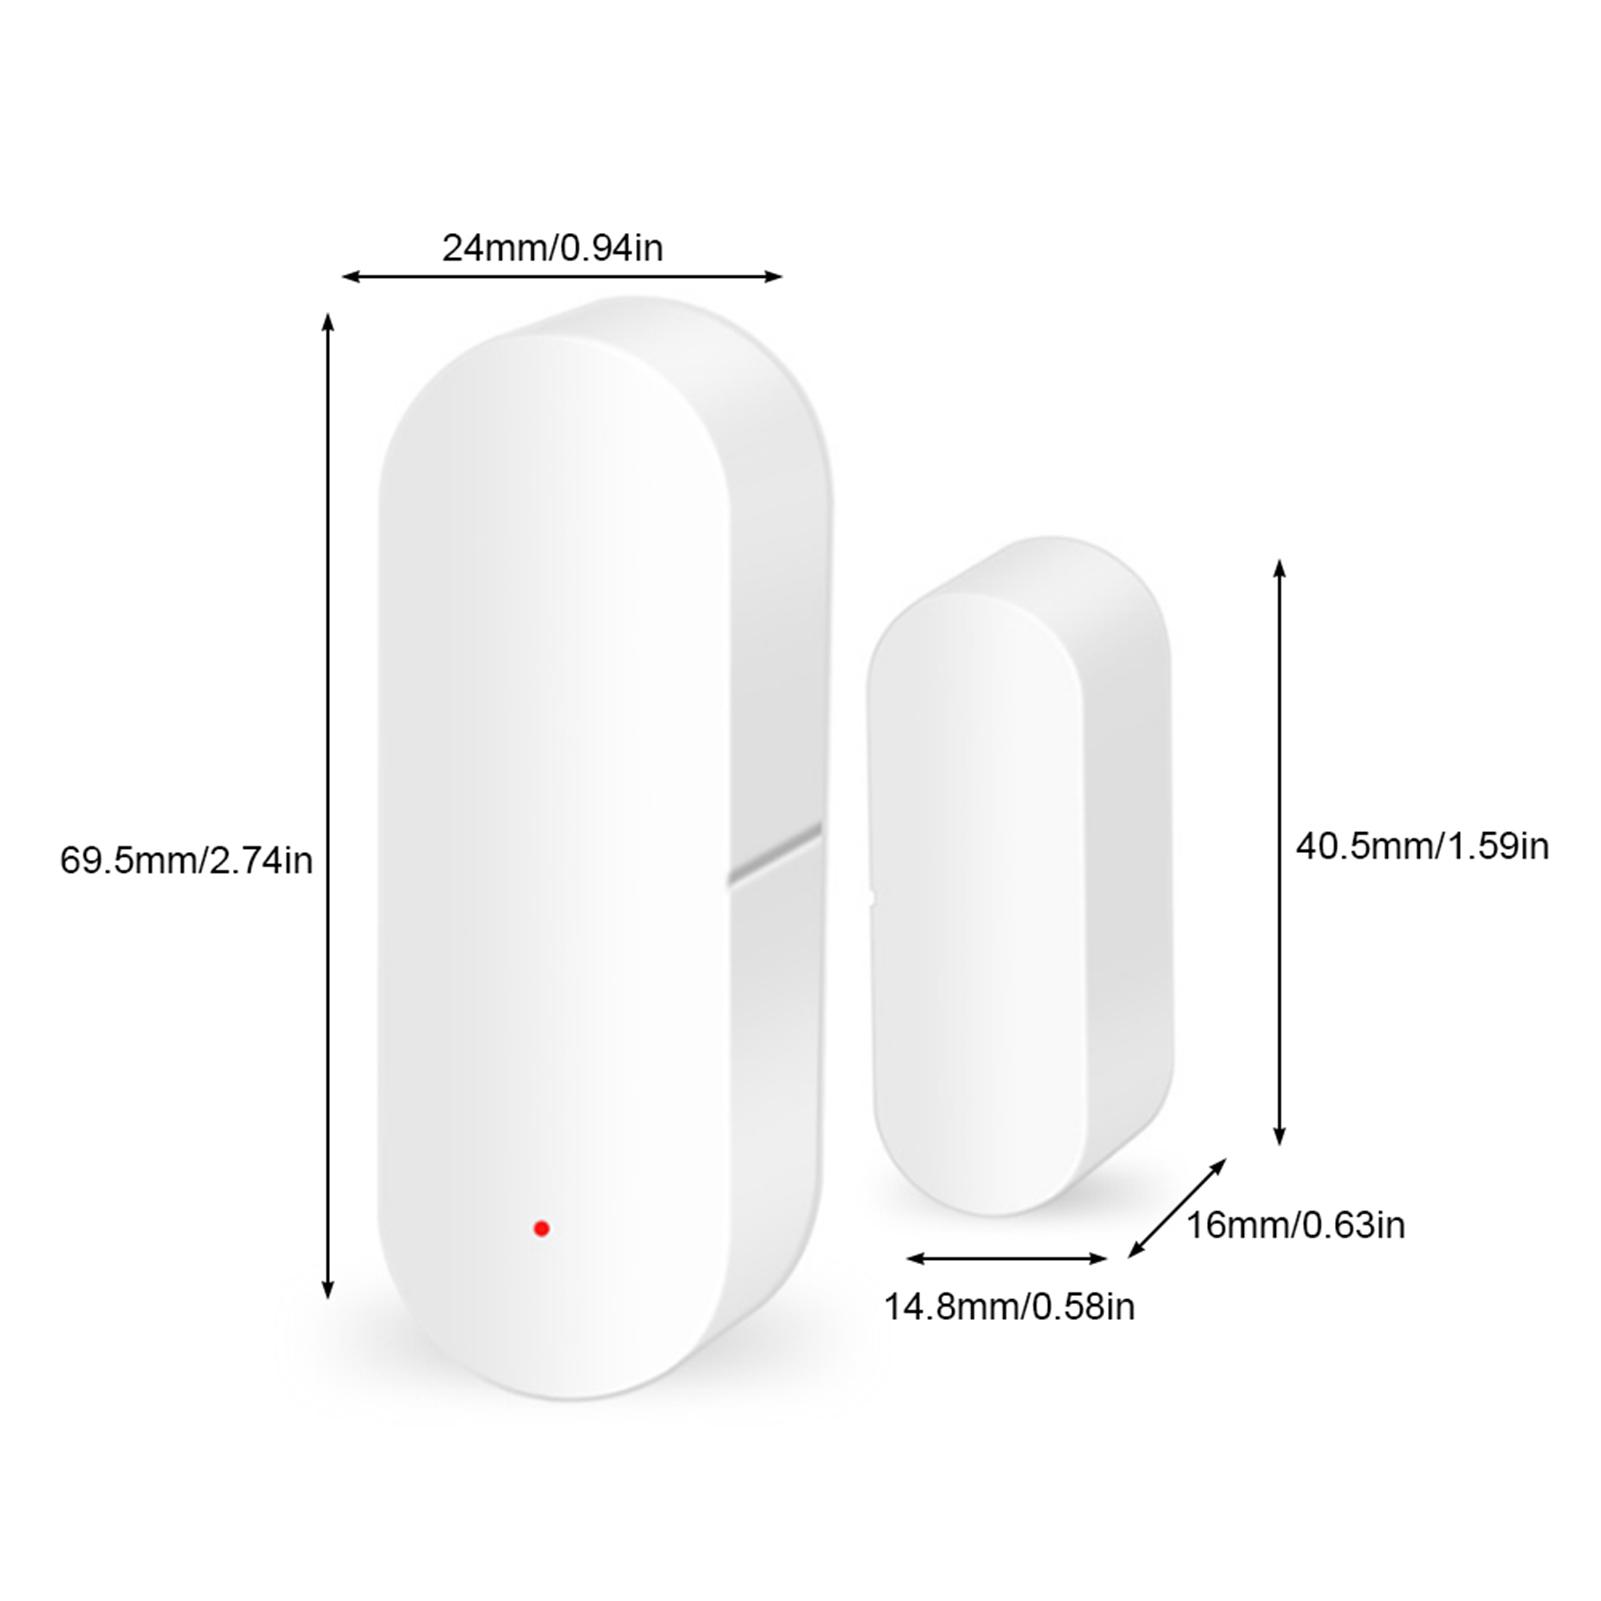 WiFi-Door-Window-Sensor-2-4Ghz-Home-Security-Detector-Support-for-Google-Home thumbnail 42